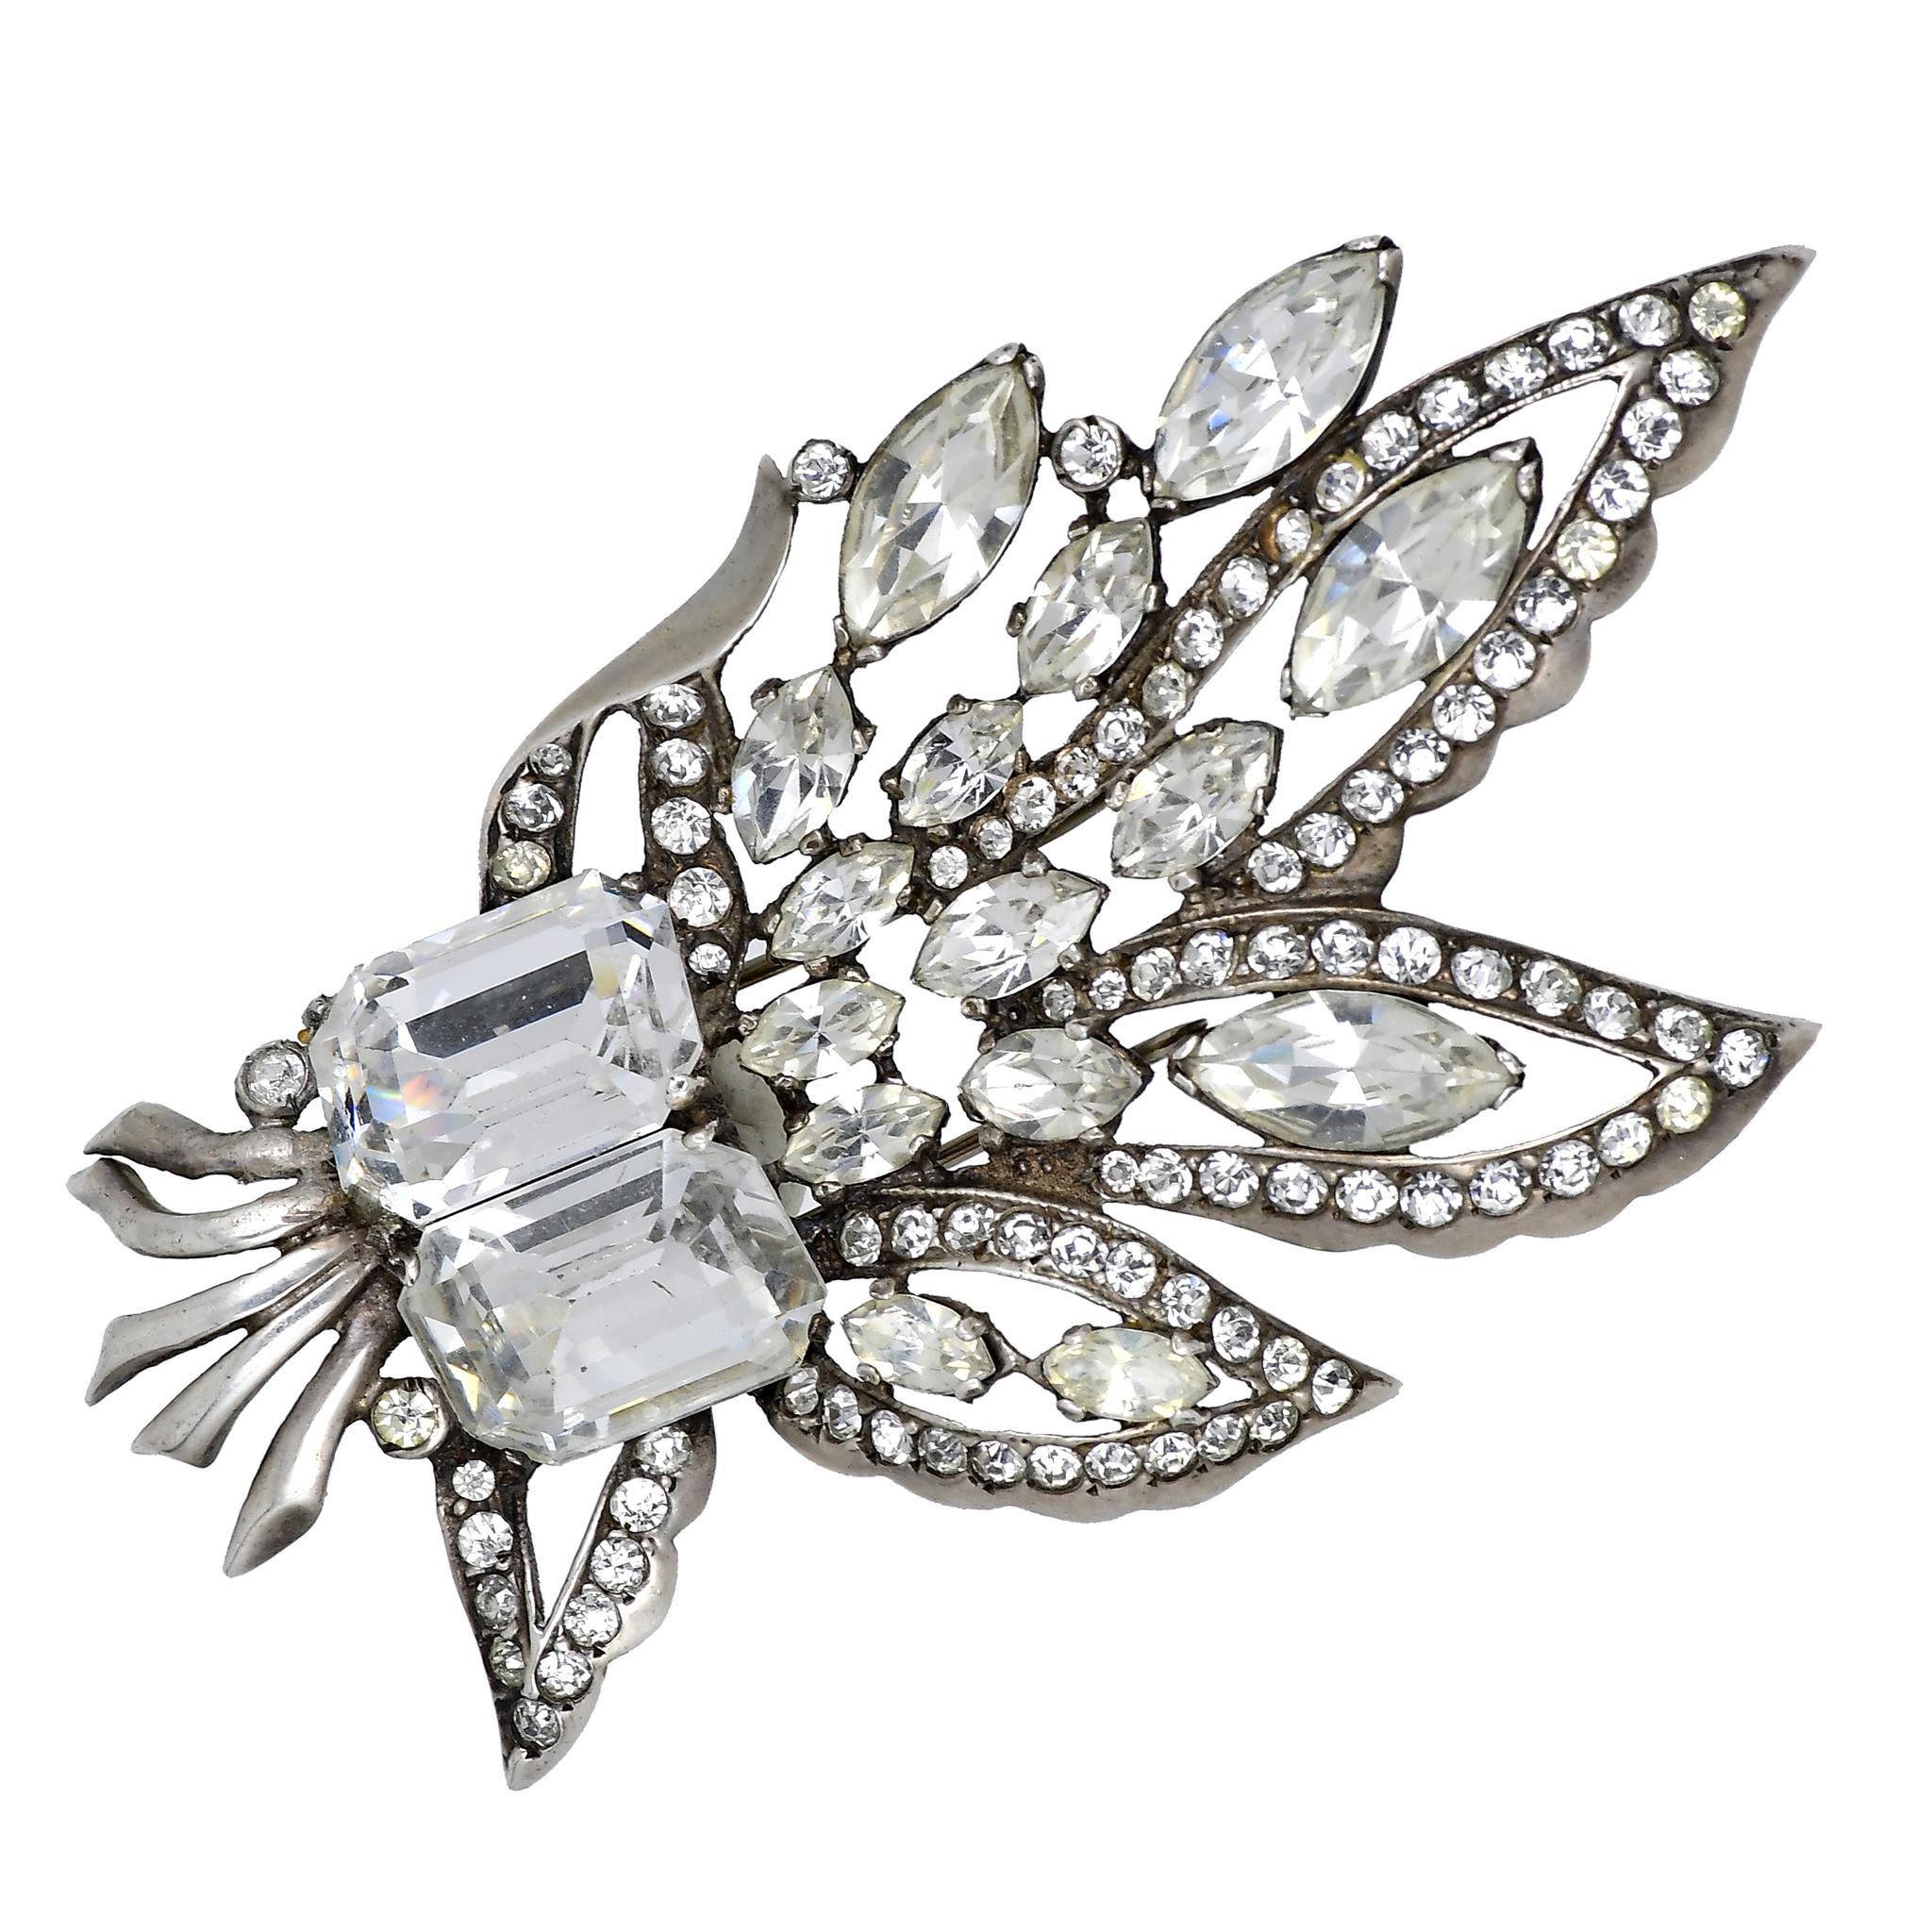 Коллекционный серебряный фур-клип Eisenberg 1940-е